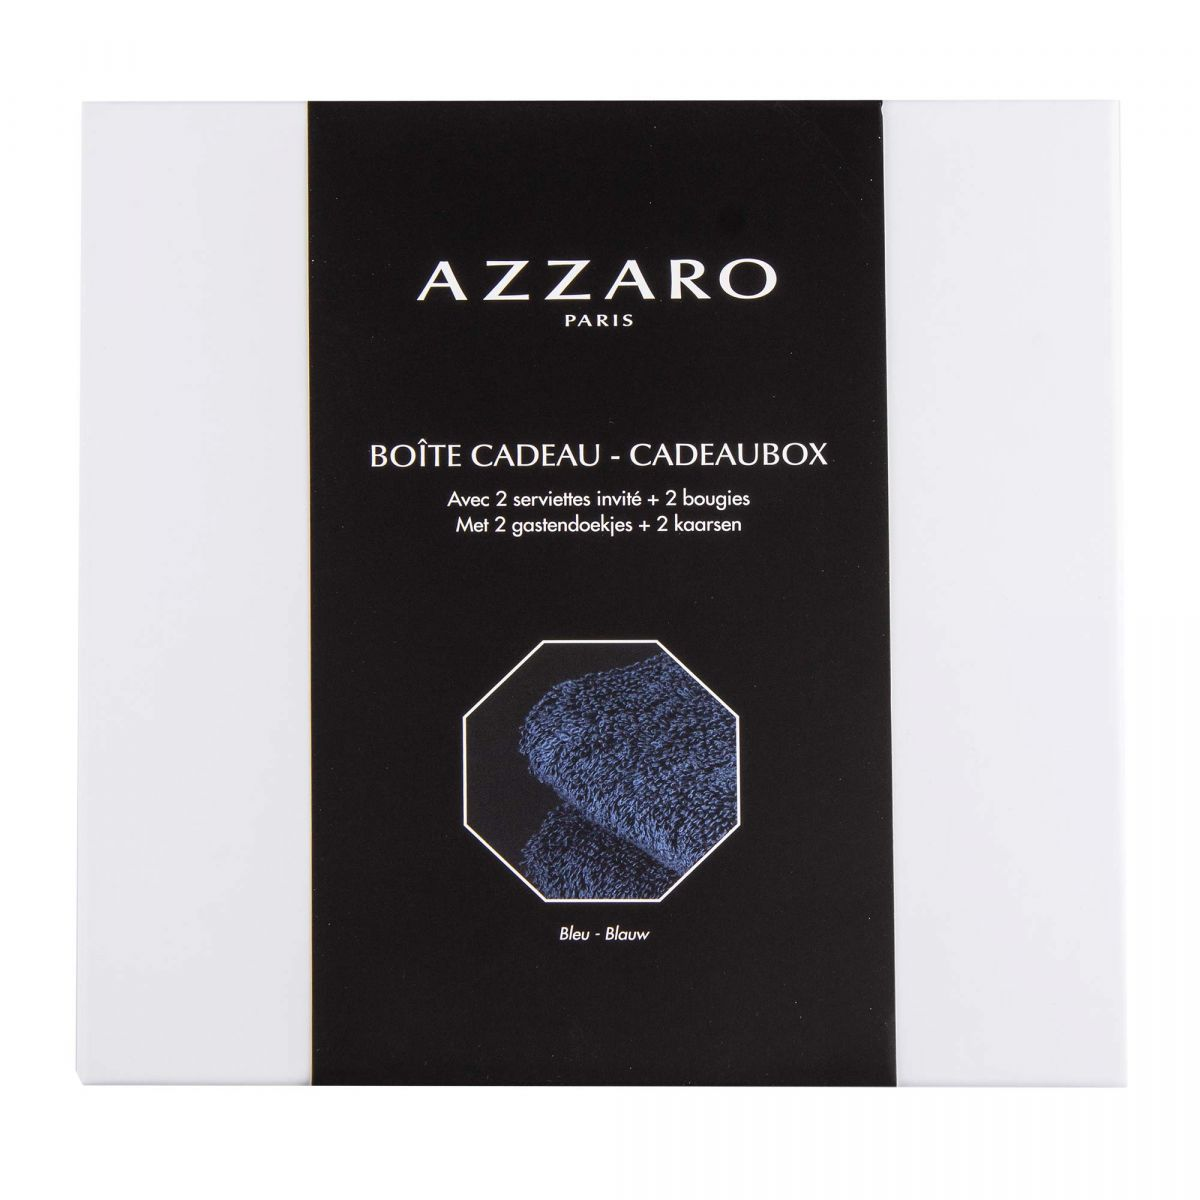 Cadeau Coffret À 2 Azzaro Prix ServiettesBougies Parfumées eWrBCodx